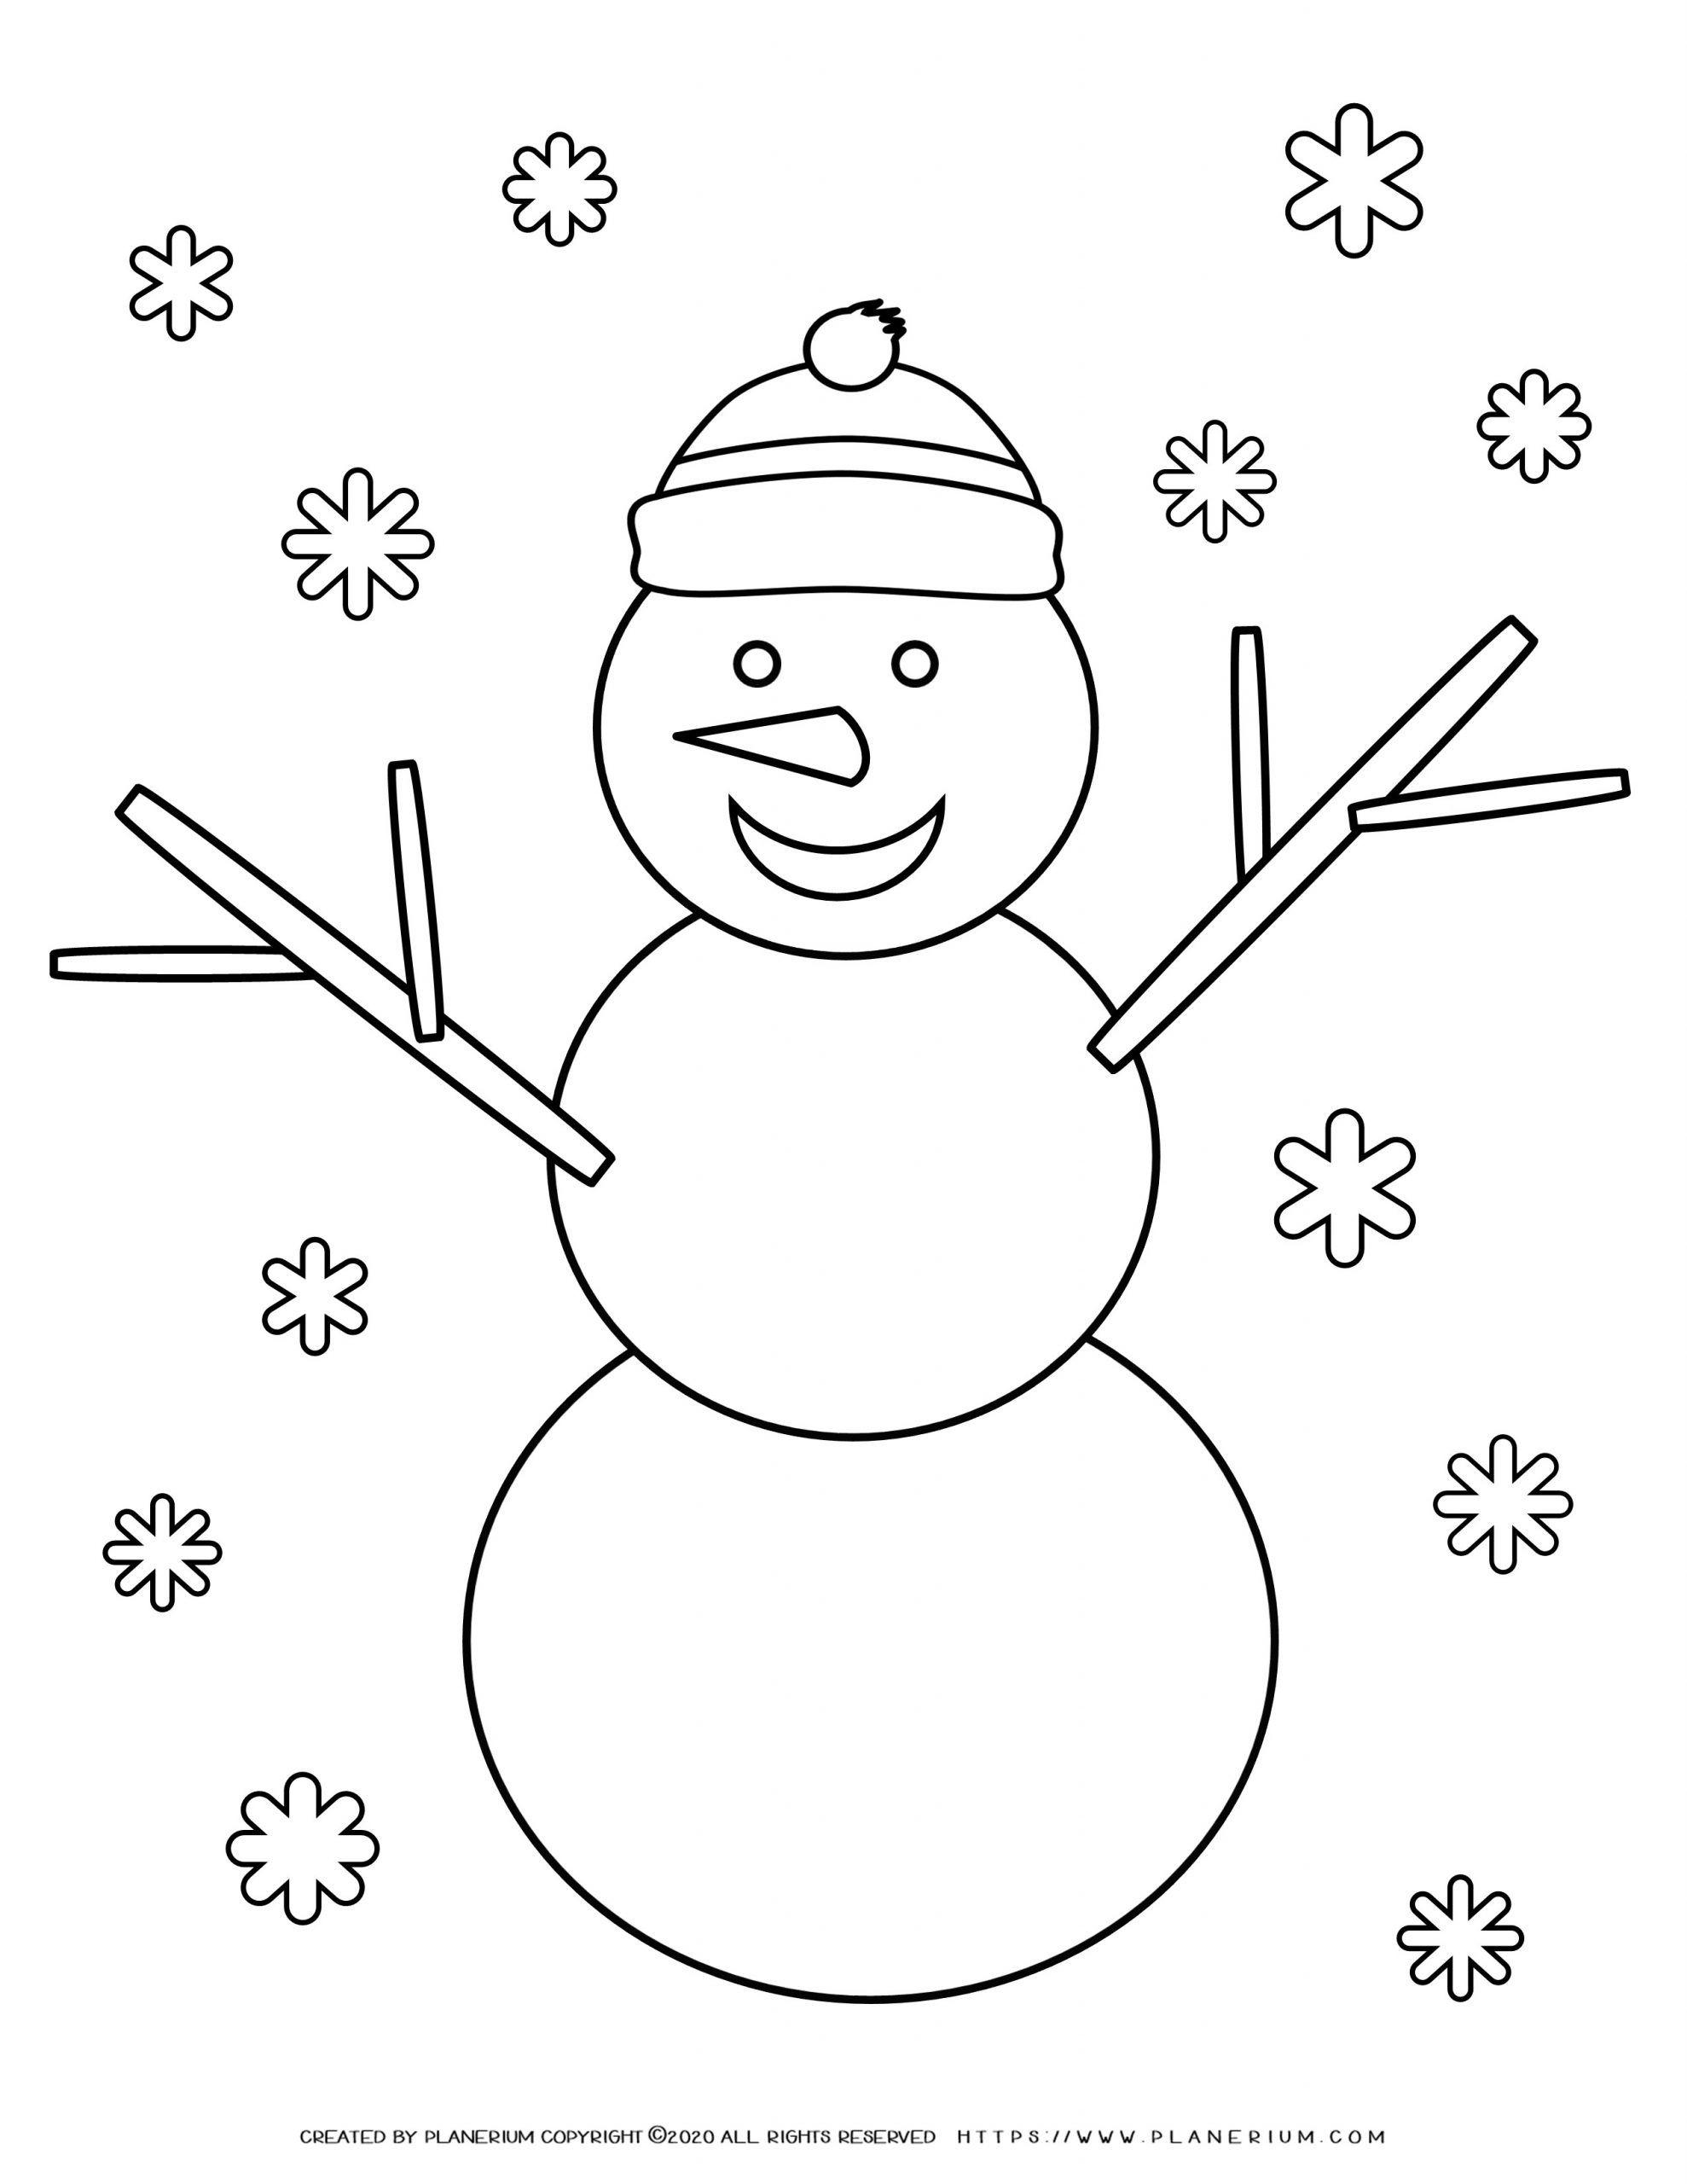 Winter Coloring Page - Snowman | Planerium